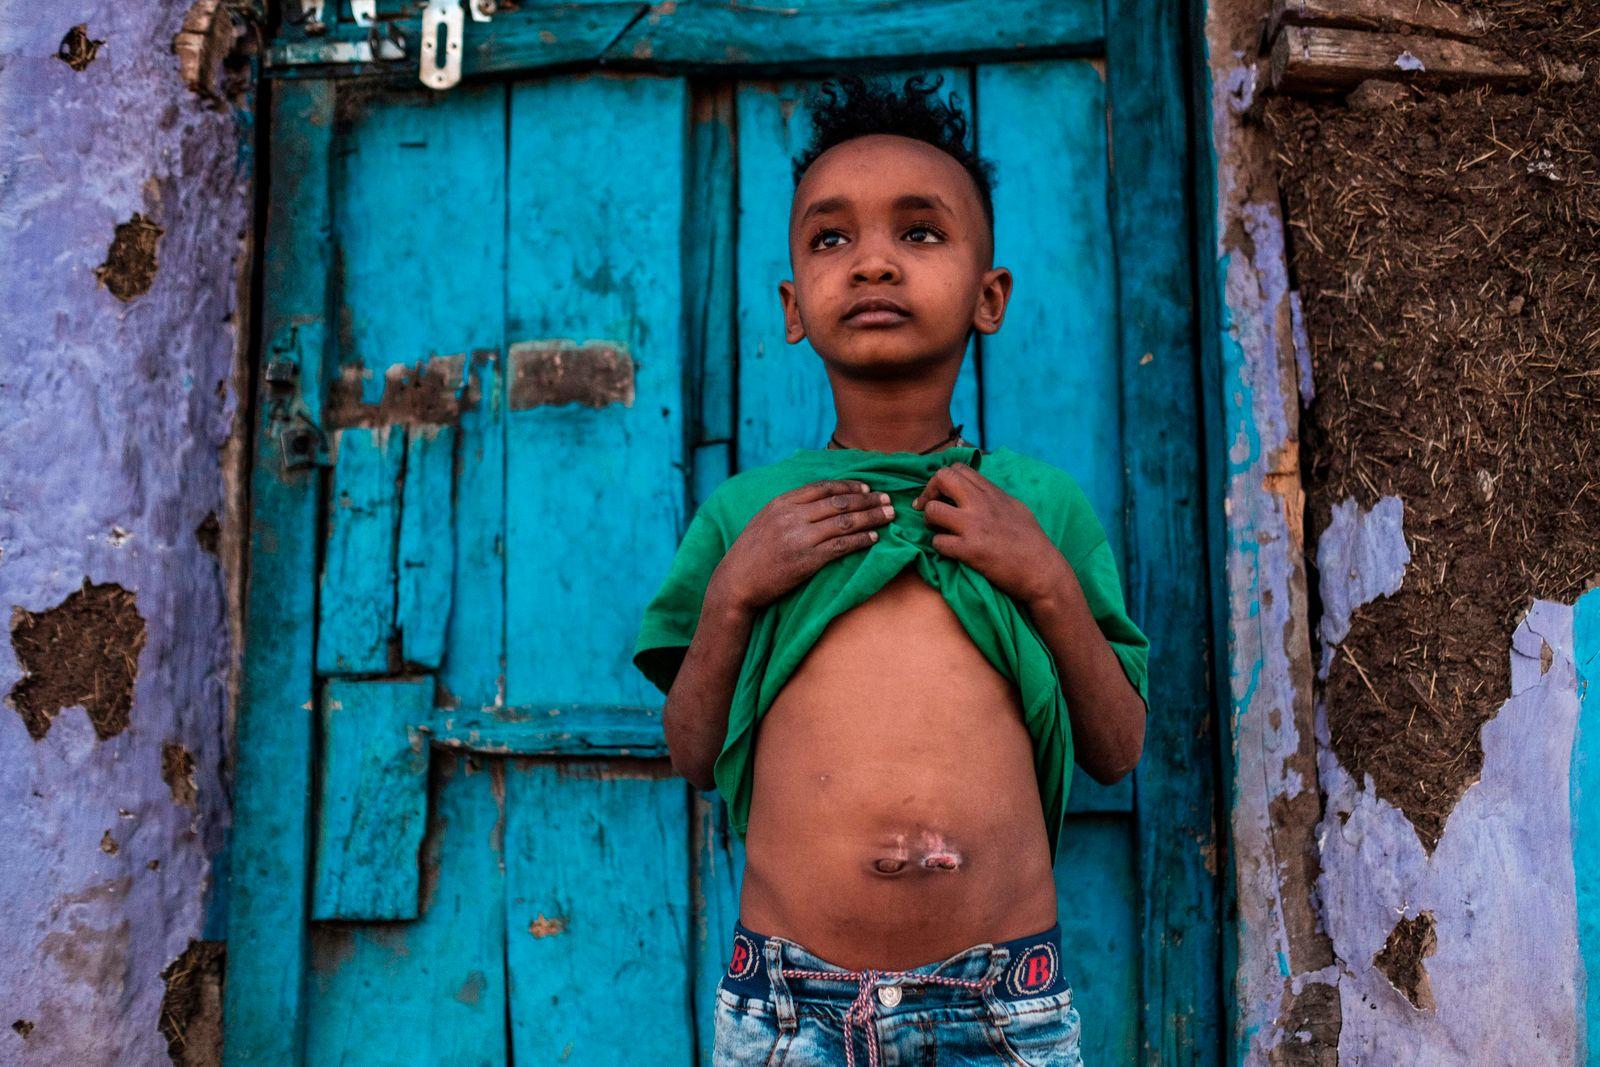 TOPSHOT-ETHIOPIA-TIGRAY-CONFLICT-UNREST